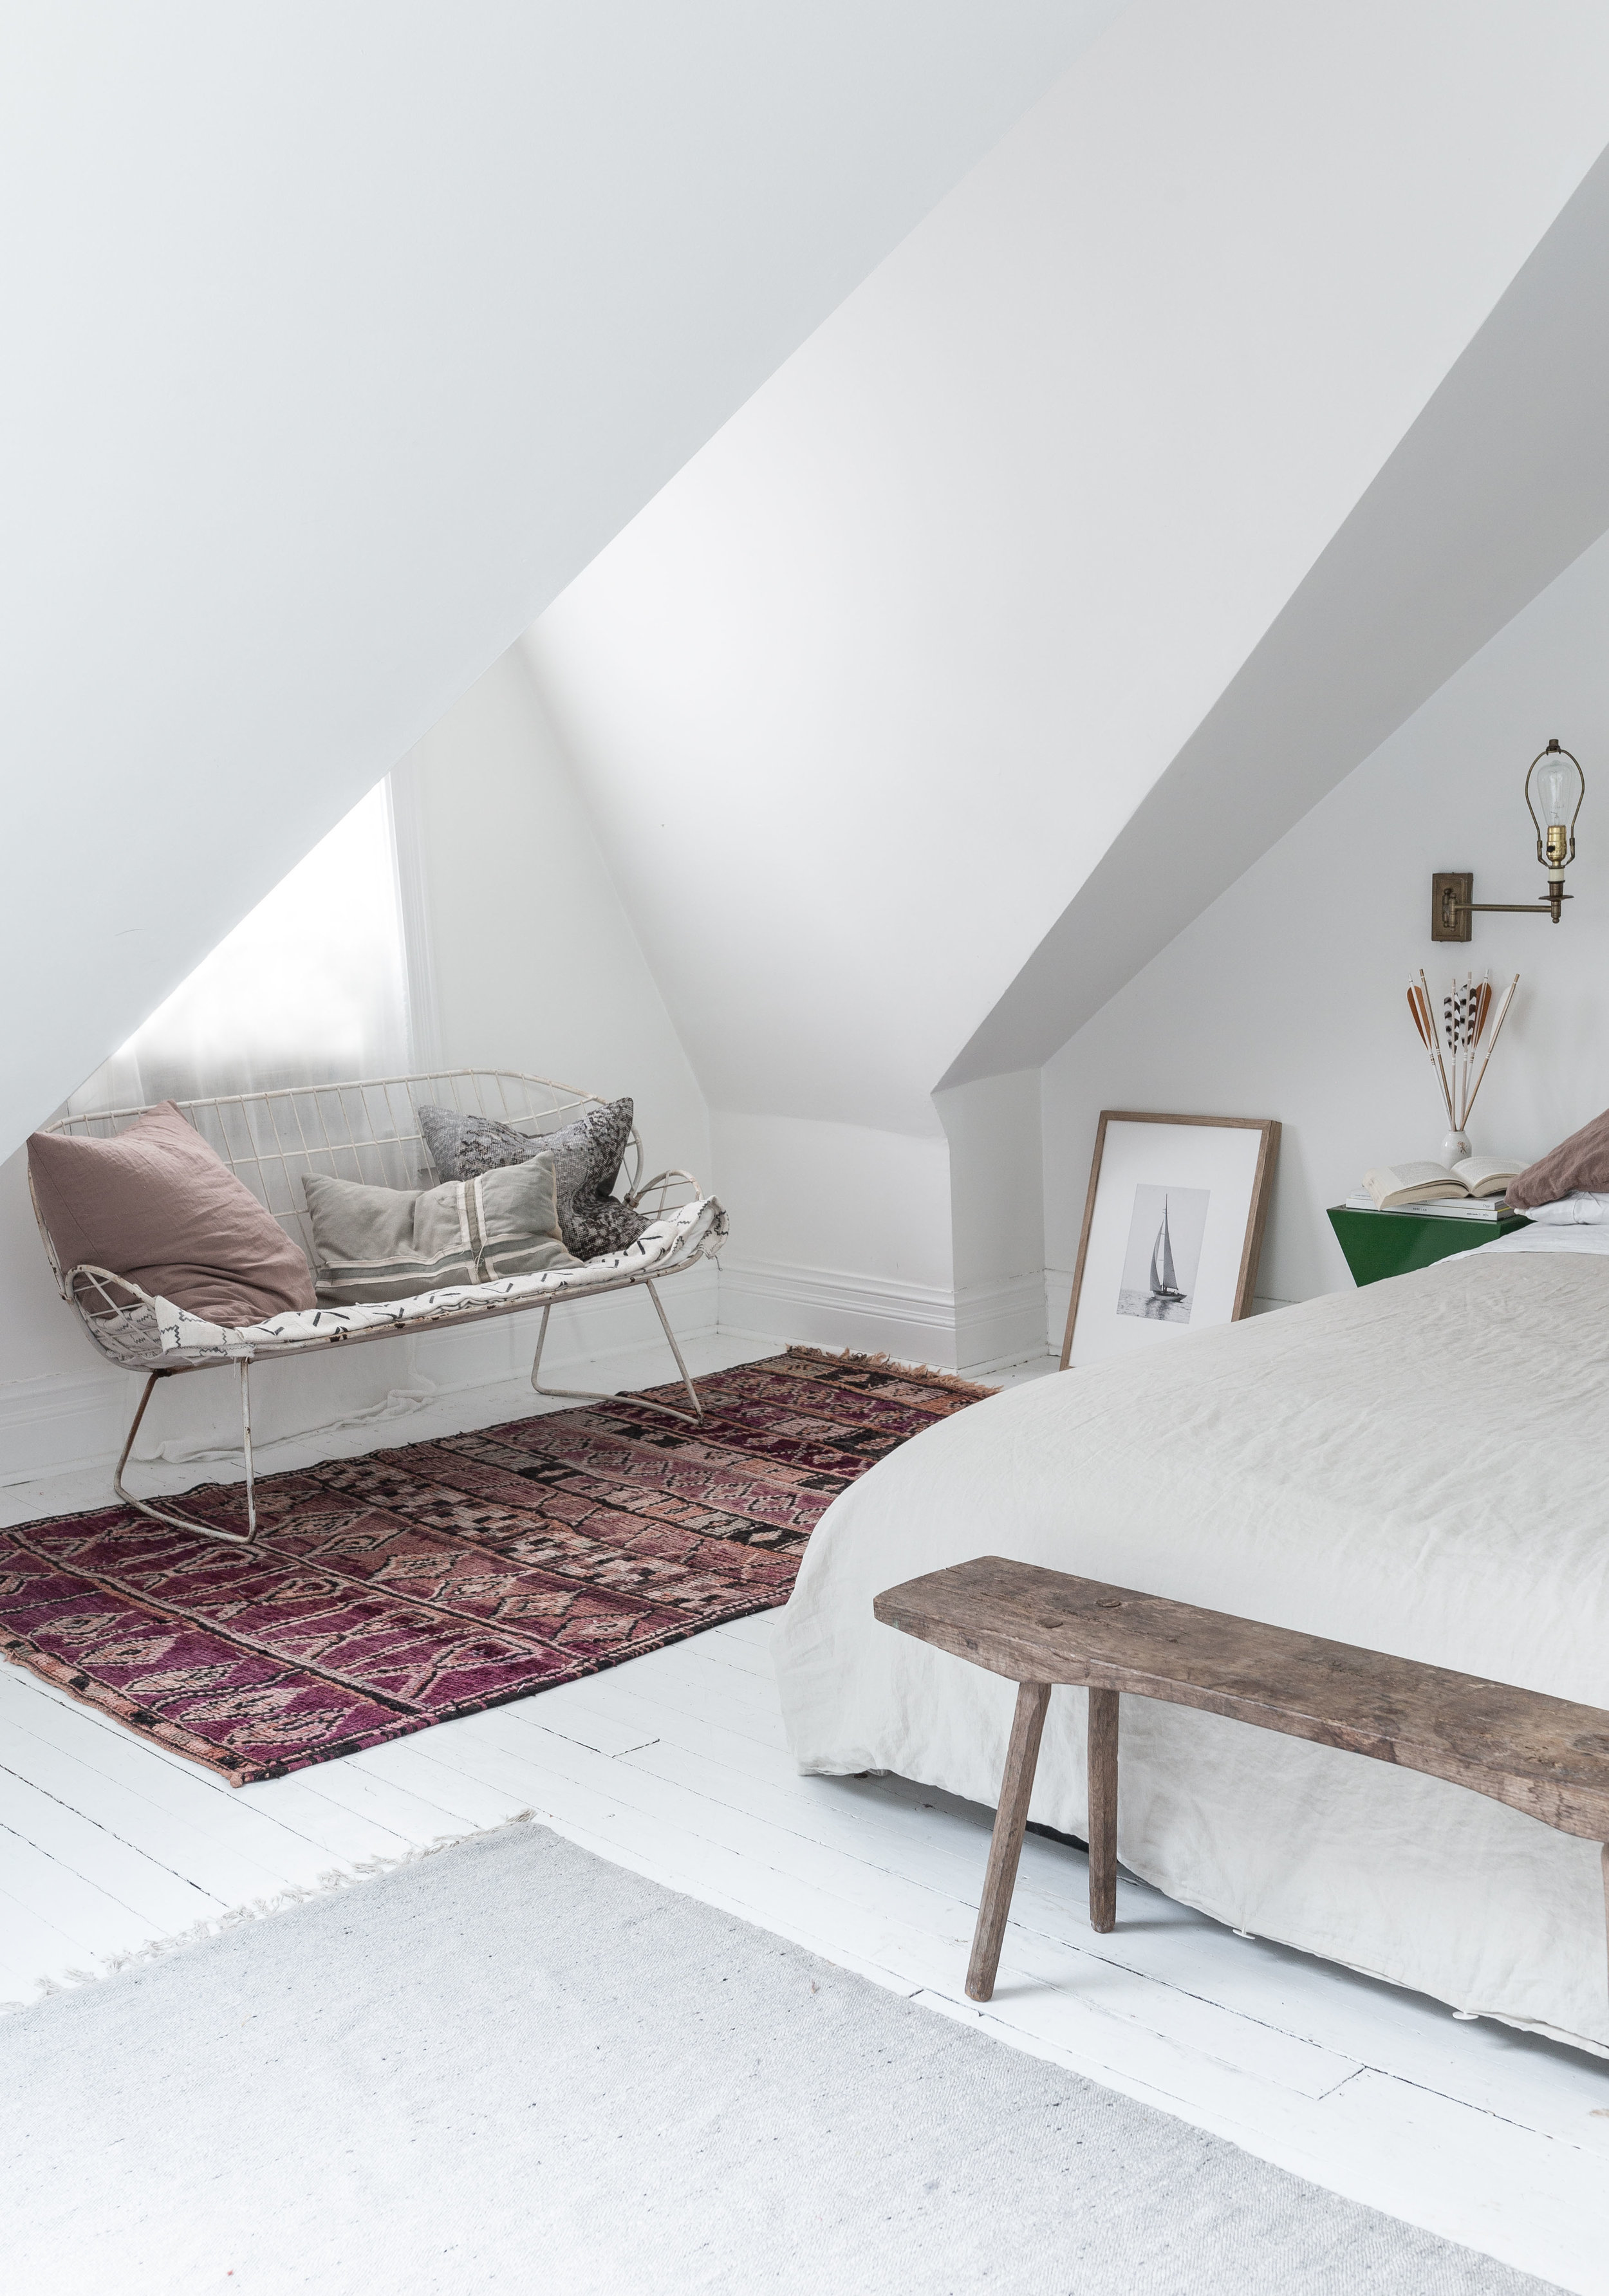 Home_Bedroom_MellahRug copy.jpg